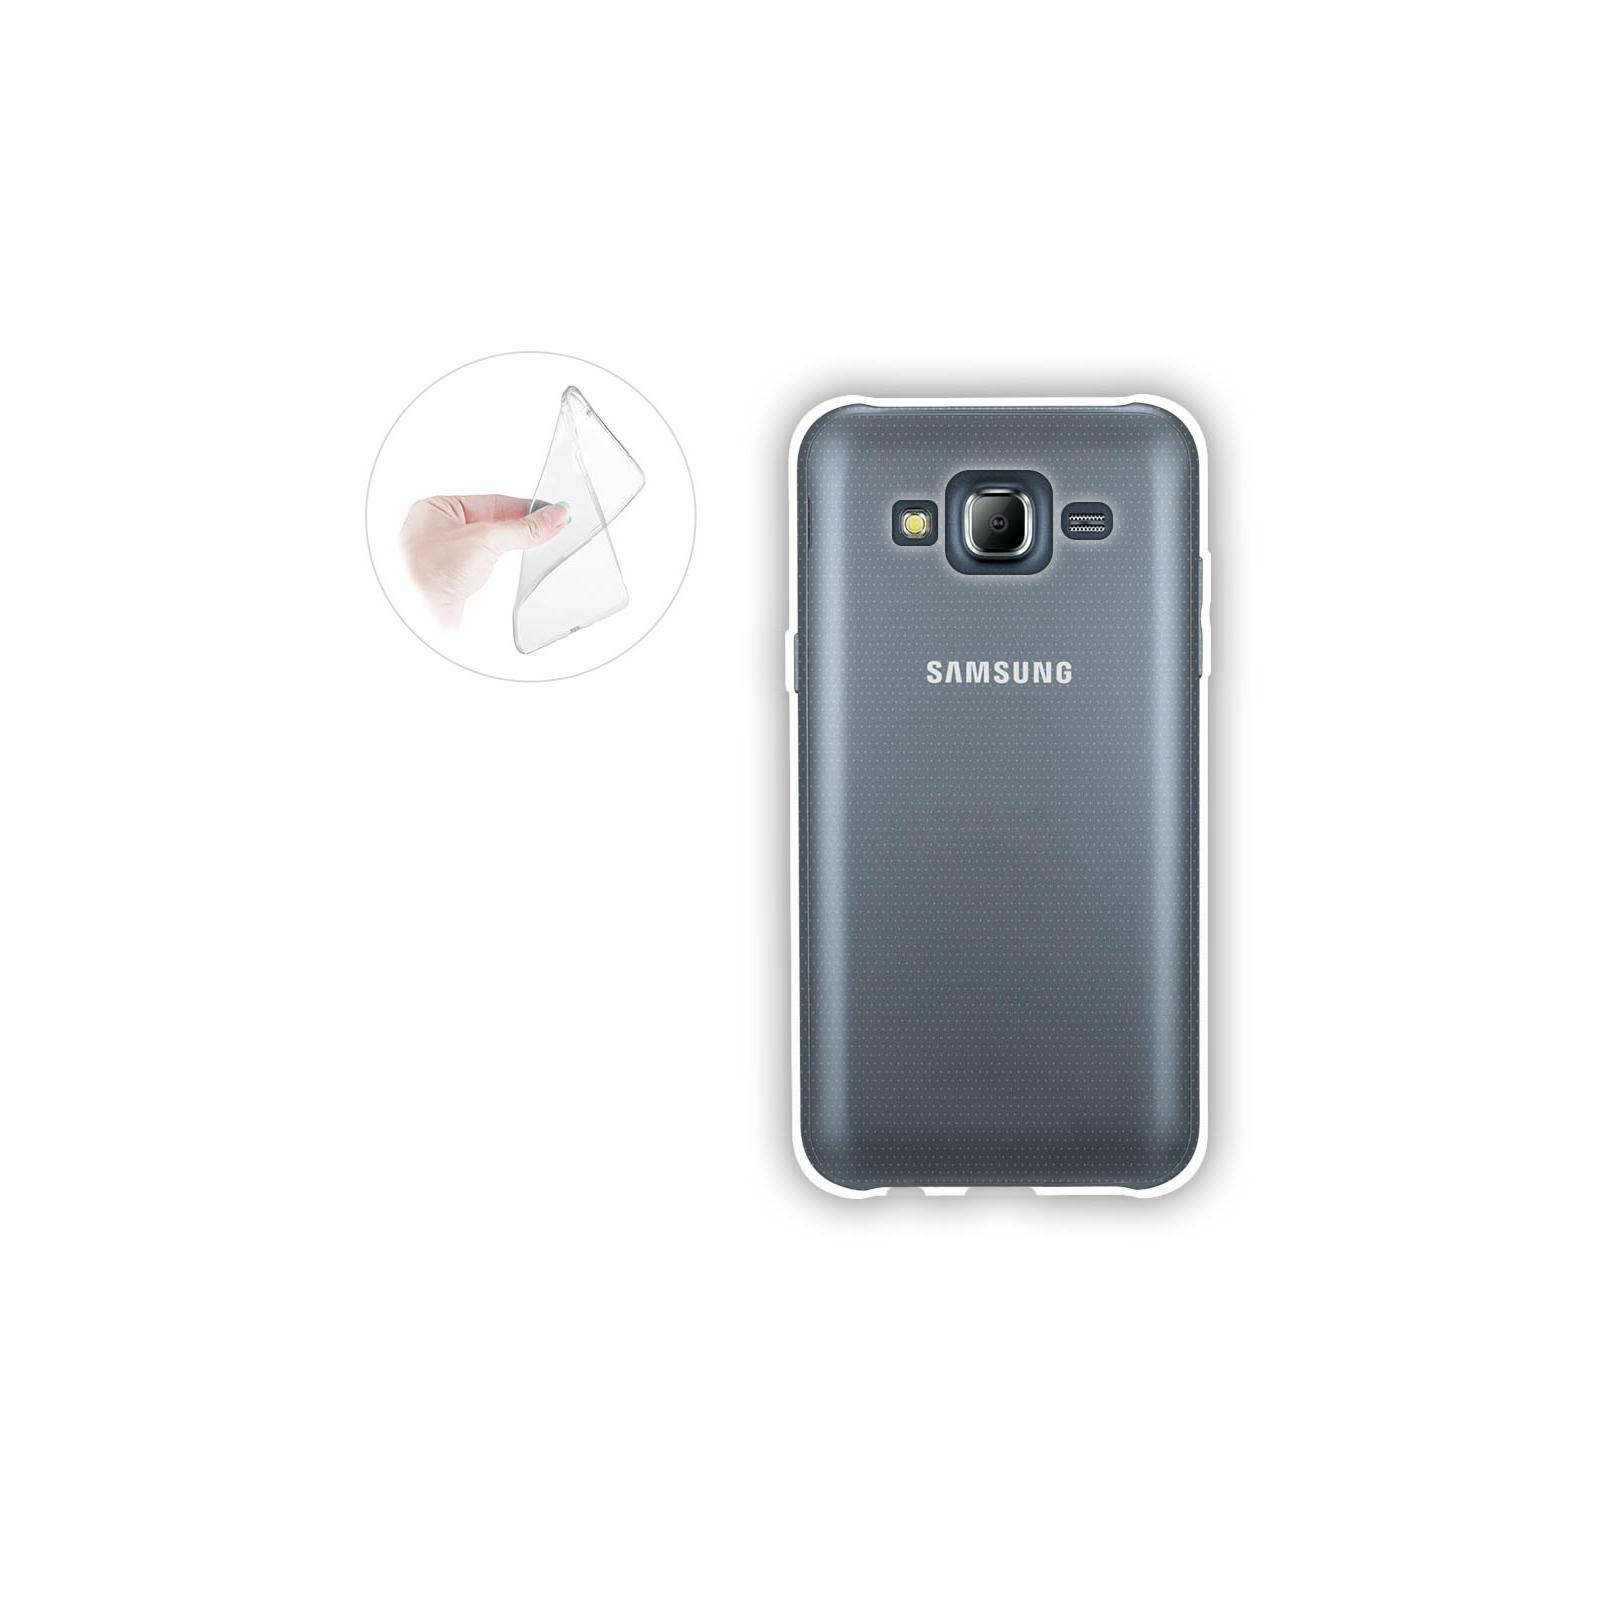 Чехол для моб. телефона Global для Samsung J500 Galaxy (светлый) (1283126467233)